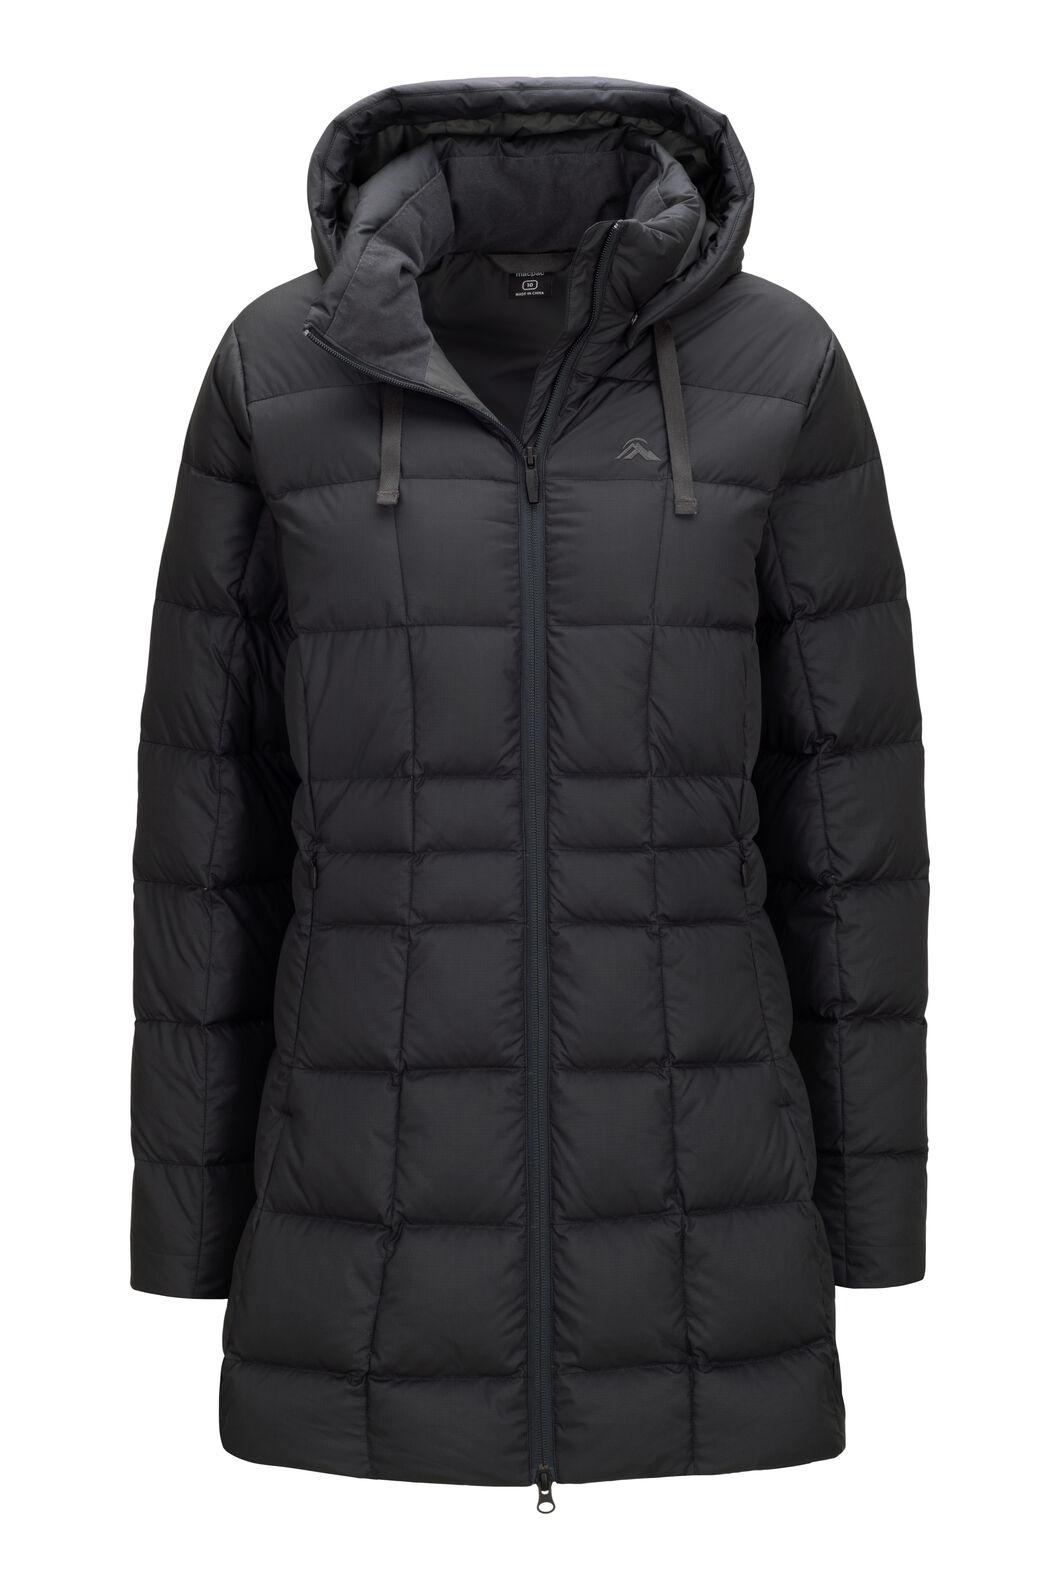 Macpac Women's Aurora Hooded Down Coat ♺, Black, hi-res